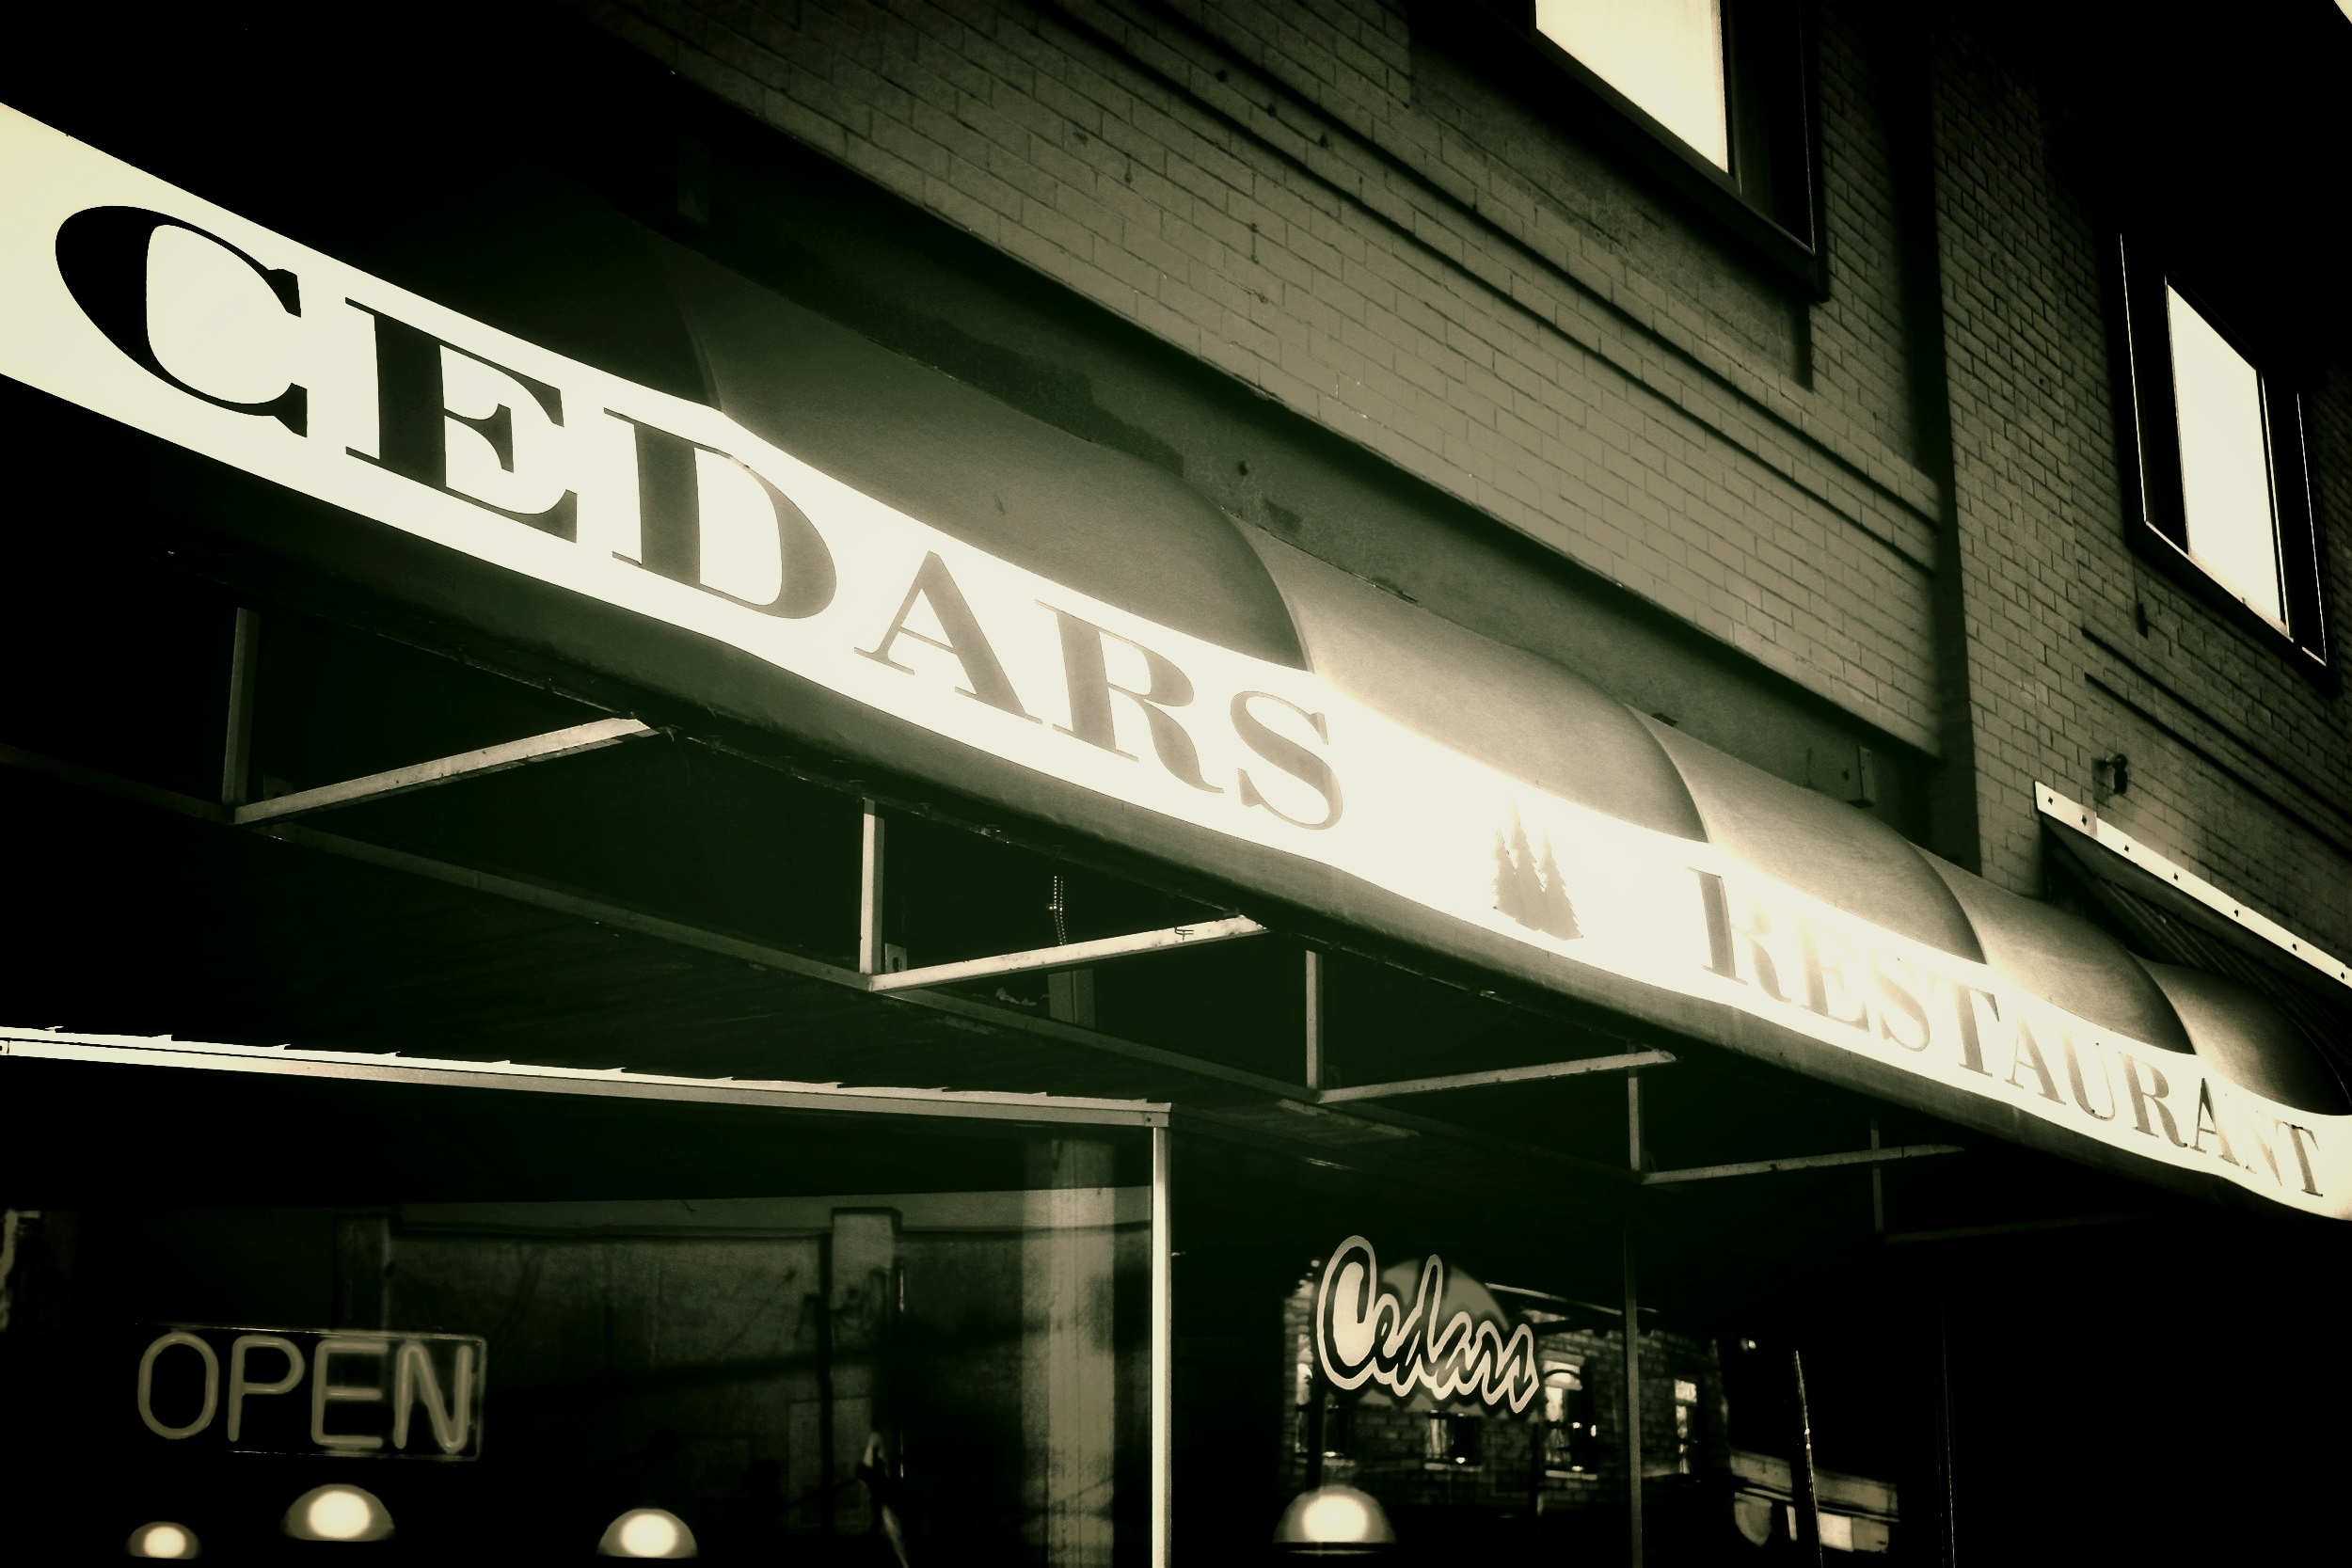 Cedars Restaurant And Lounge Ferndale Wa